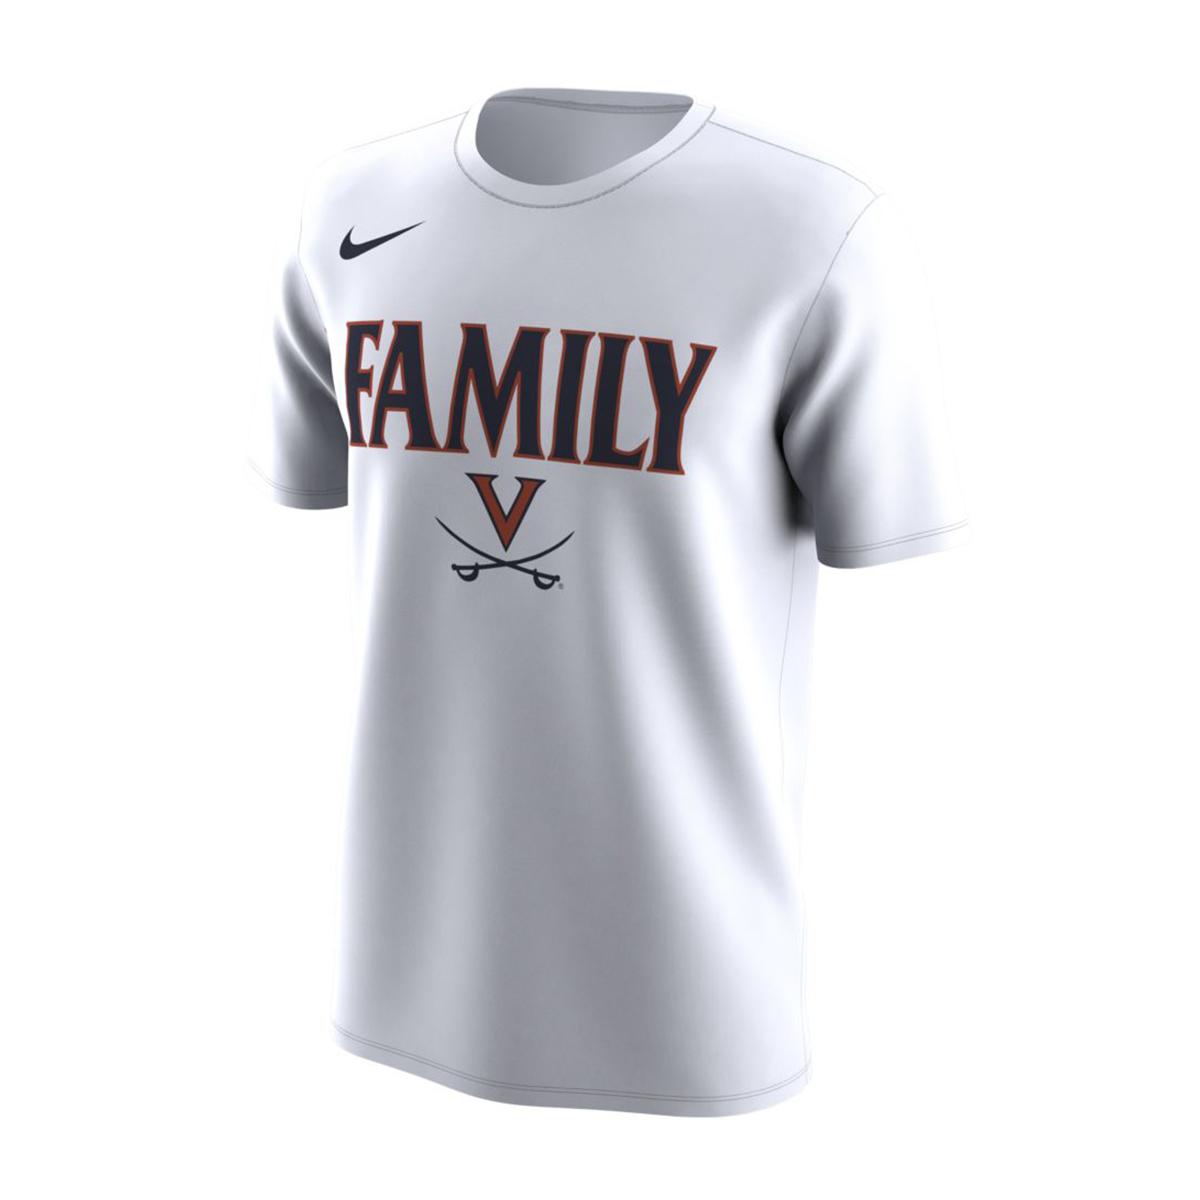 University of Virginia 2019 Bench Youth T-shirt